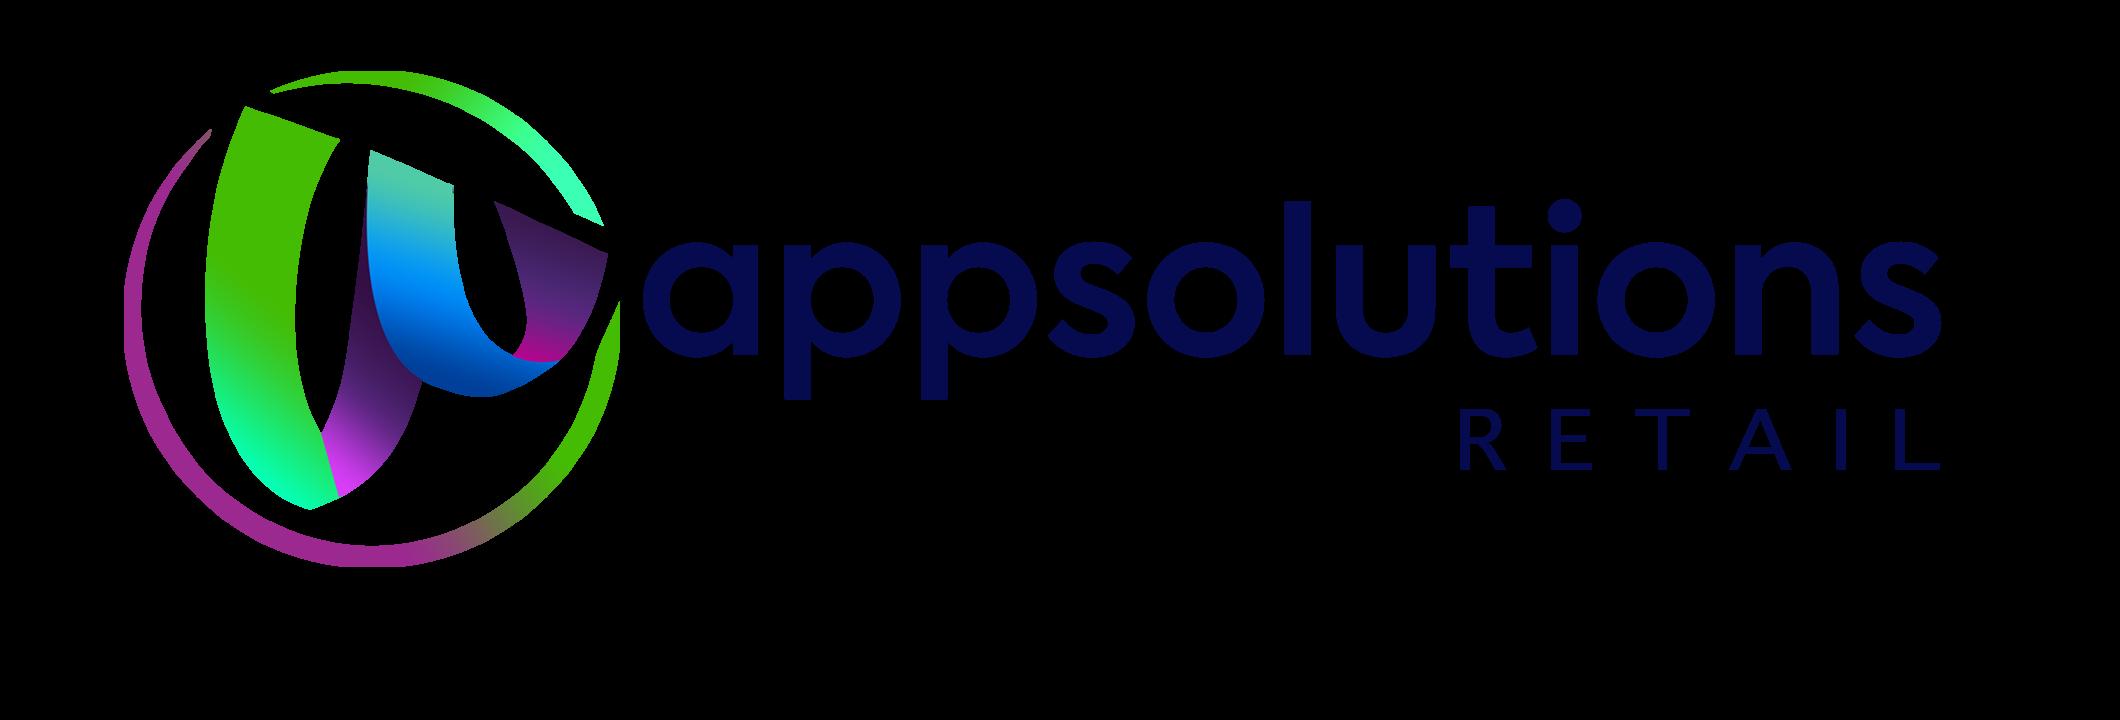 Wappsolutions.net